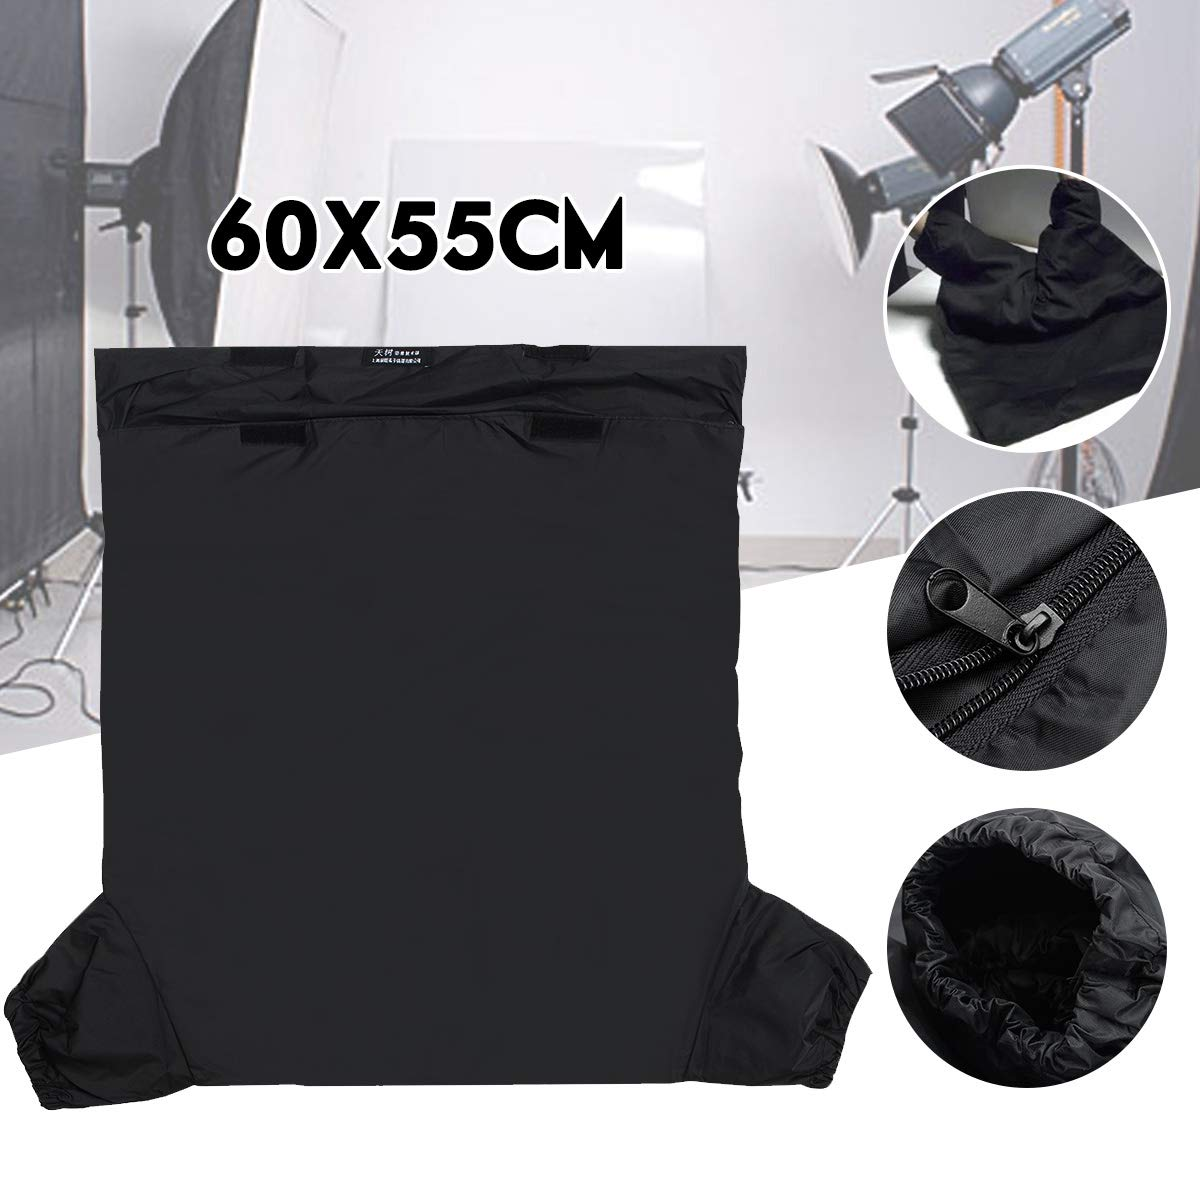 Grau Gr XL 890371 036 Gunsmoke036 Nike Damen Racer Tights